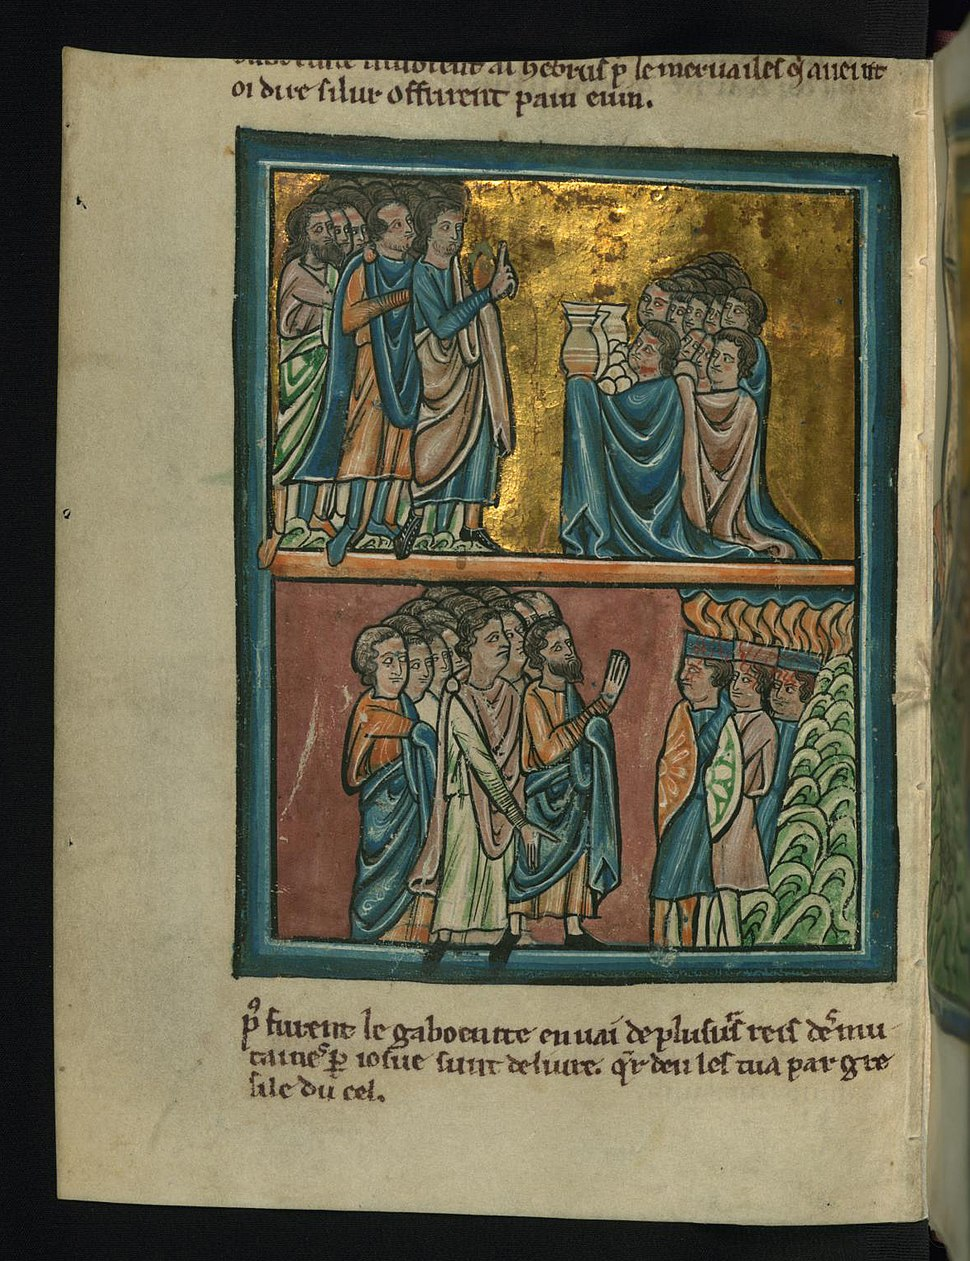 William de Brailes - Top - The Gibeonites Make Peace (Joshua 9 -3-15) - Walters W10619V - Full Page